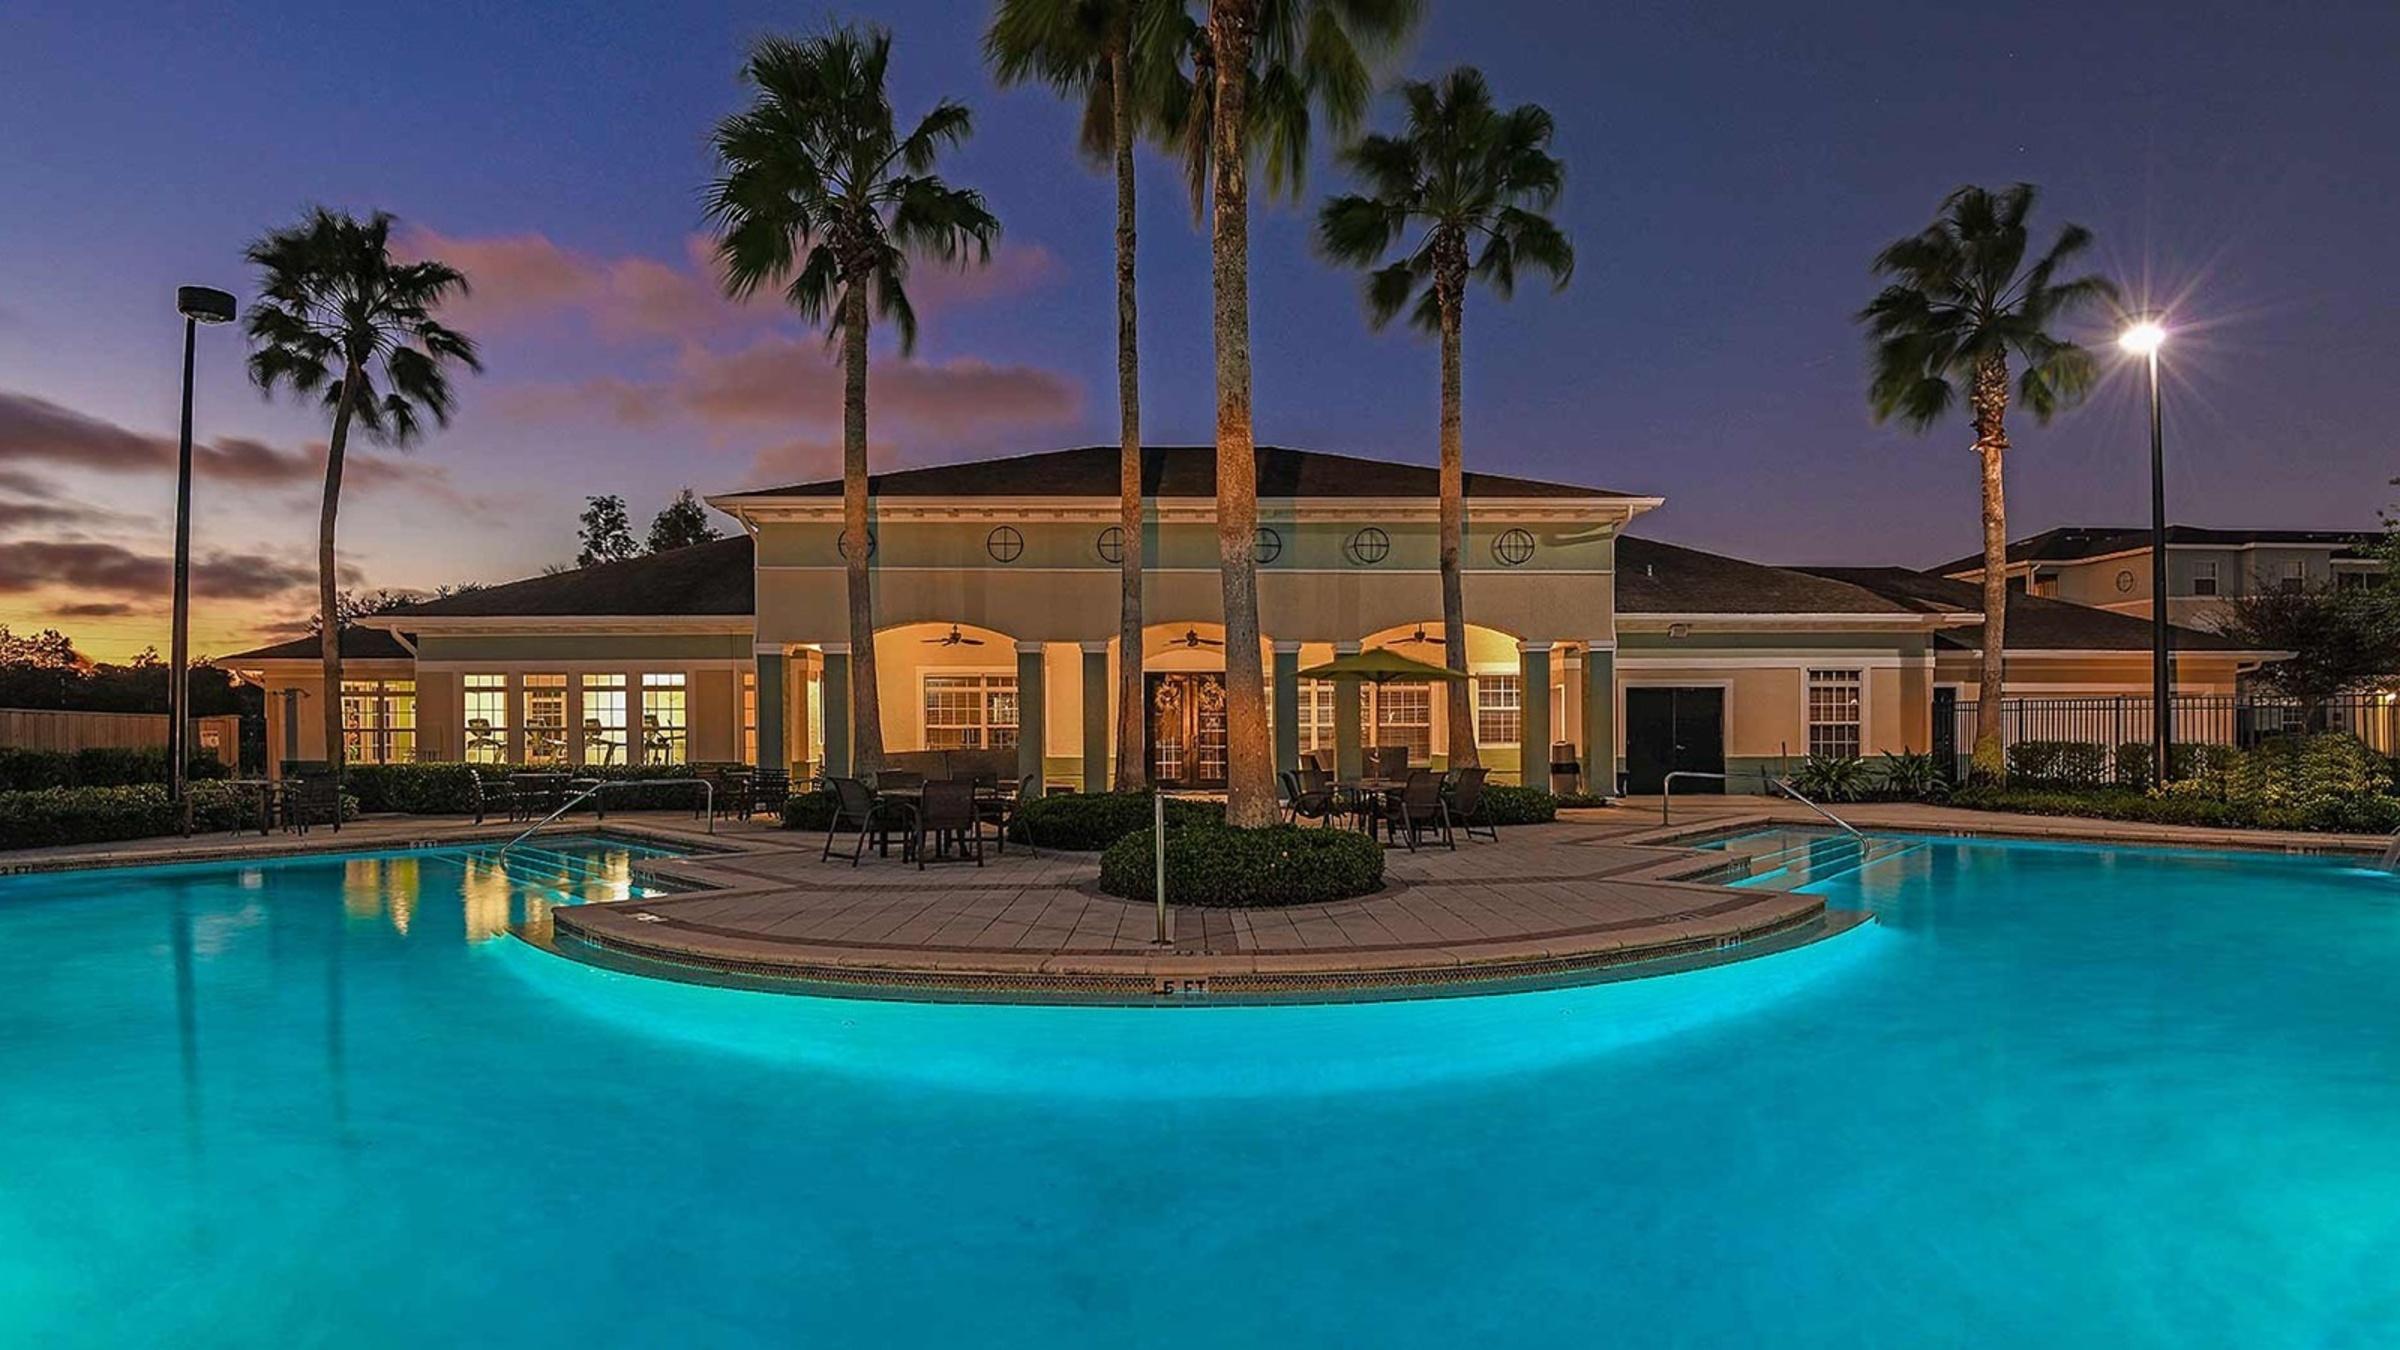 Villas at Gateway